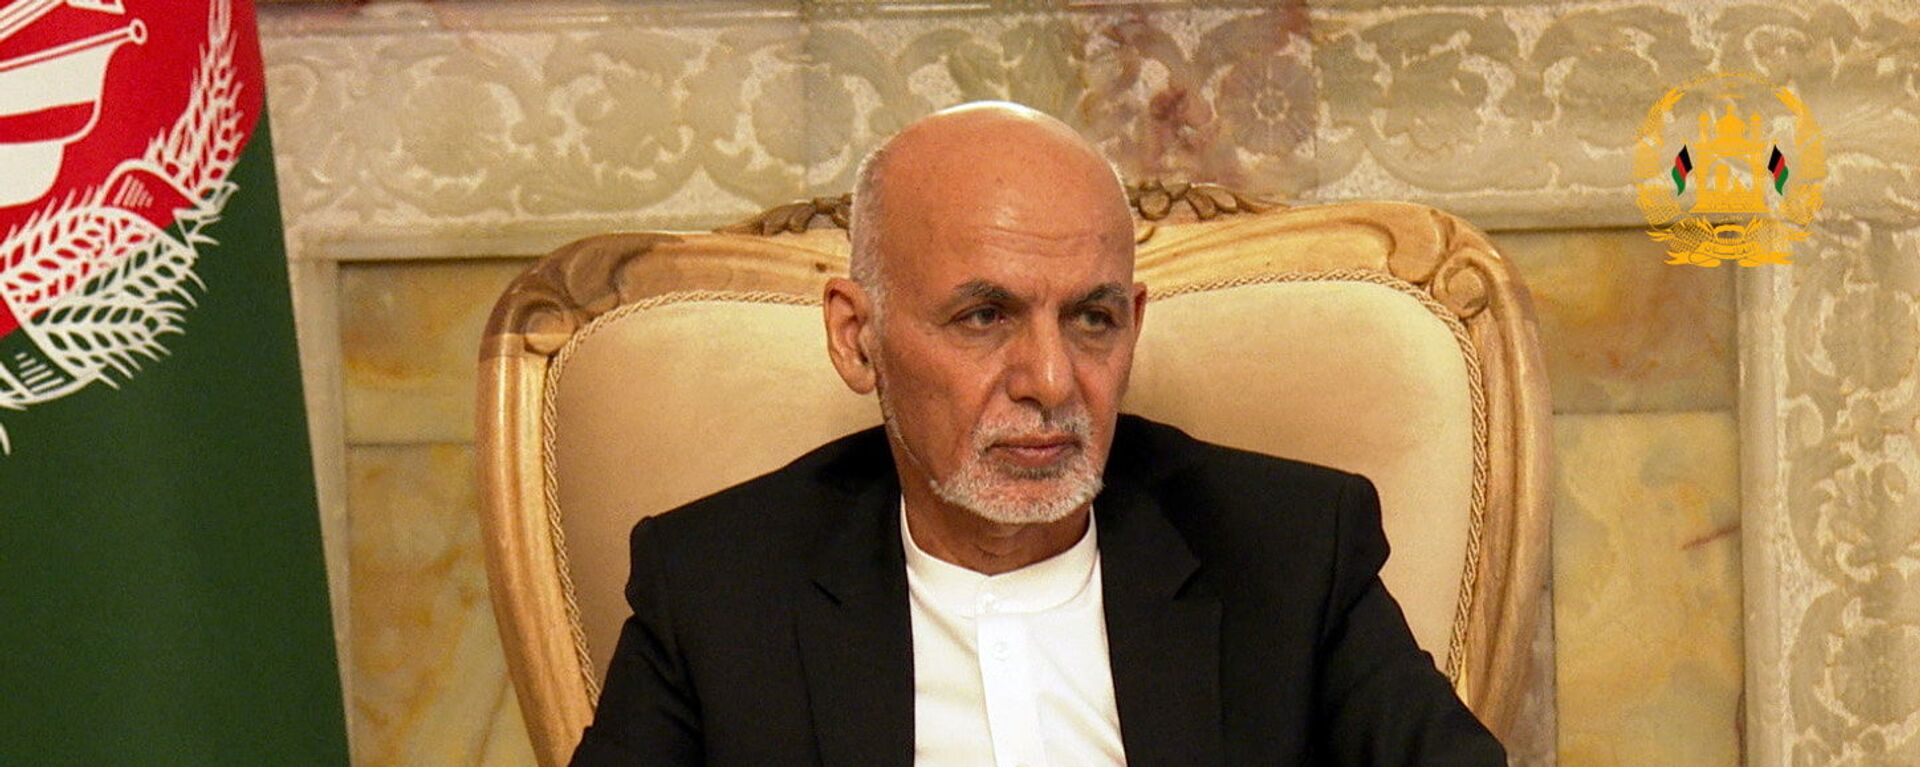 Afghanistans Präsident Aschraf Ghani - SNA, 1920, 01.09.2021